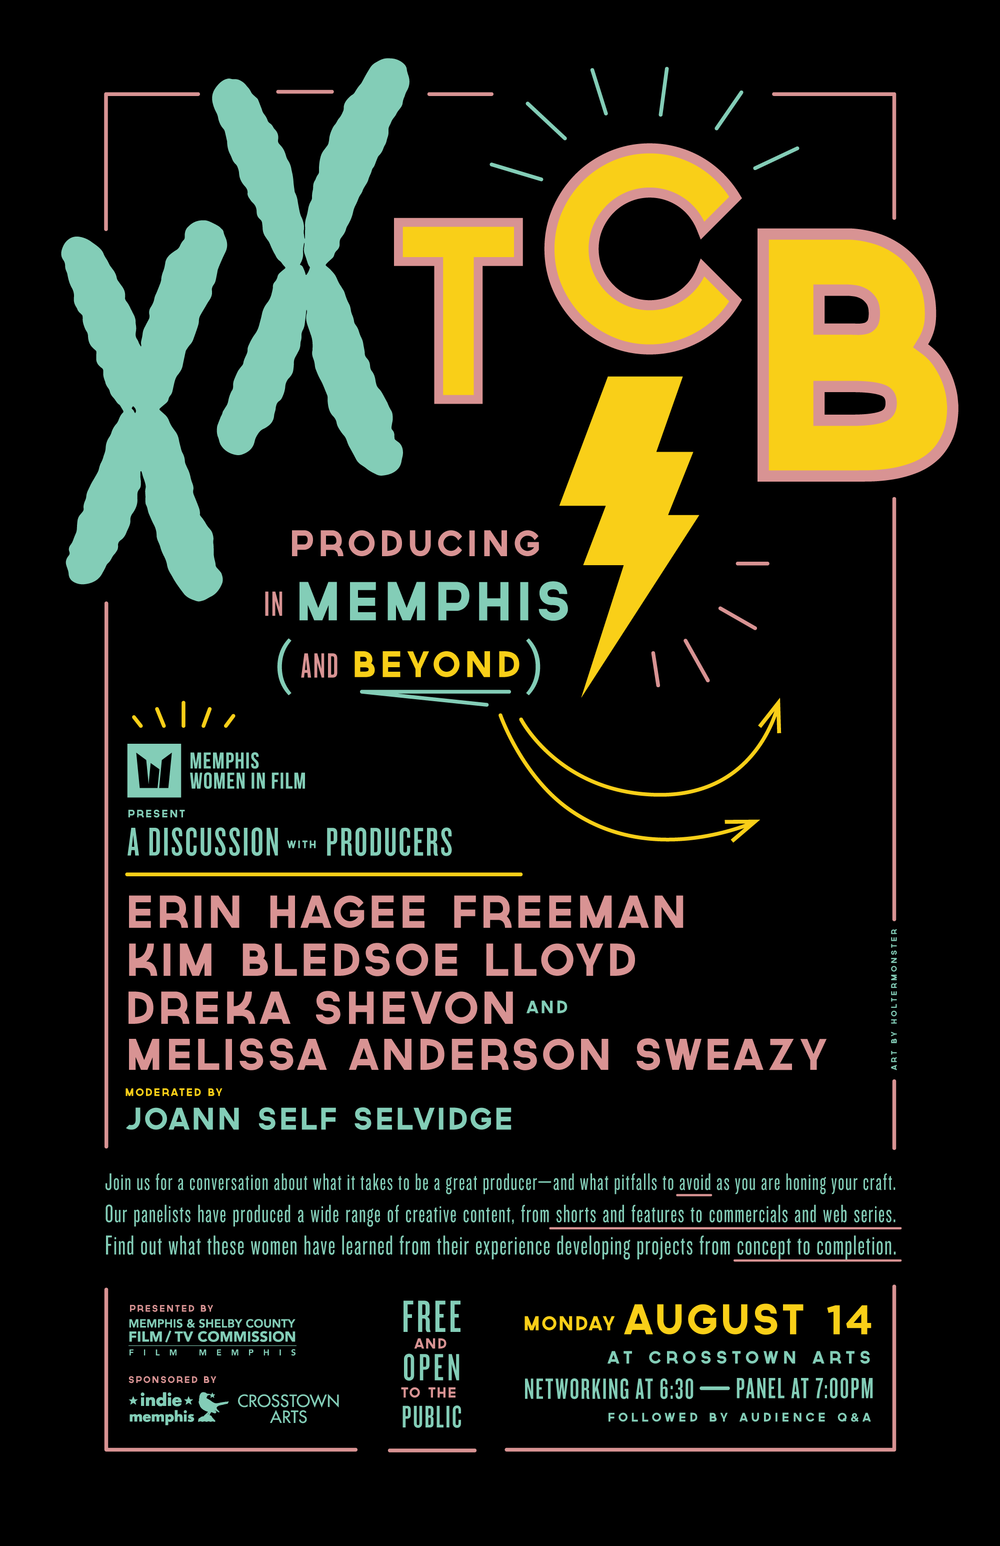 XXTCB-poster-web.png